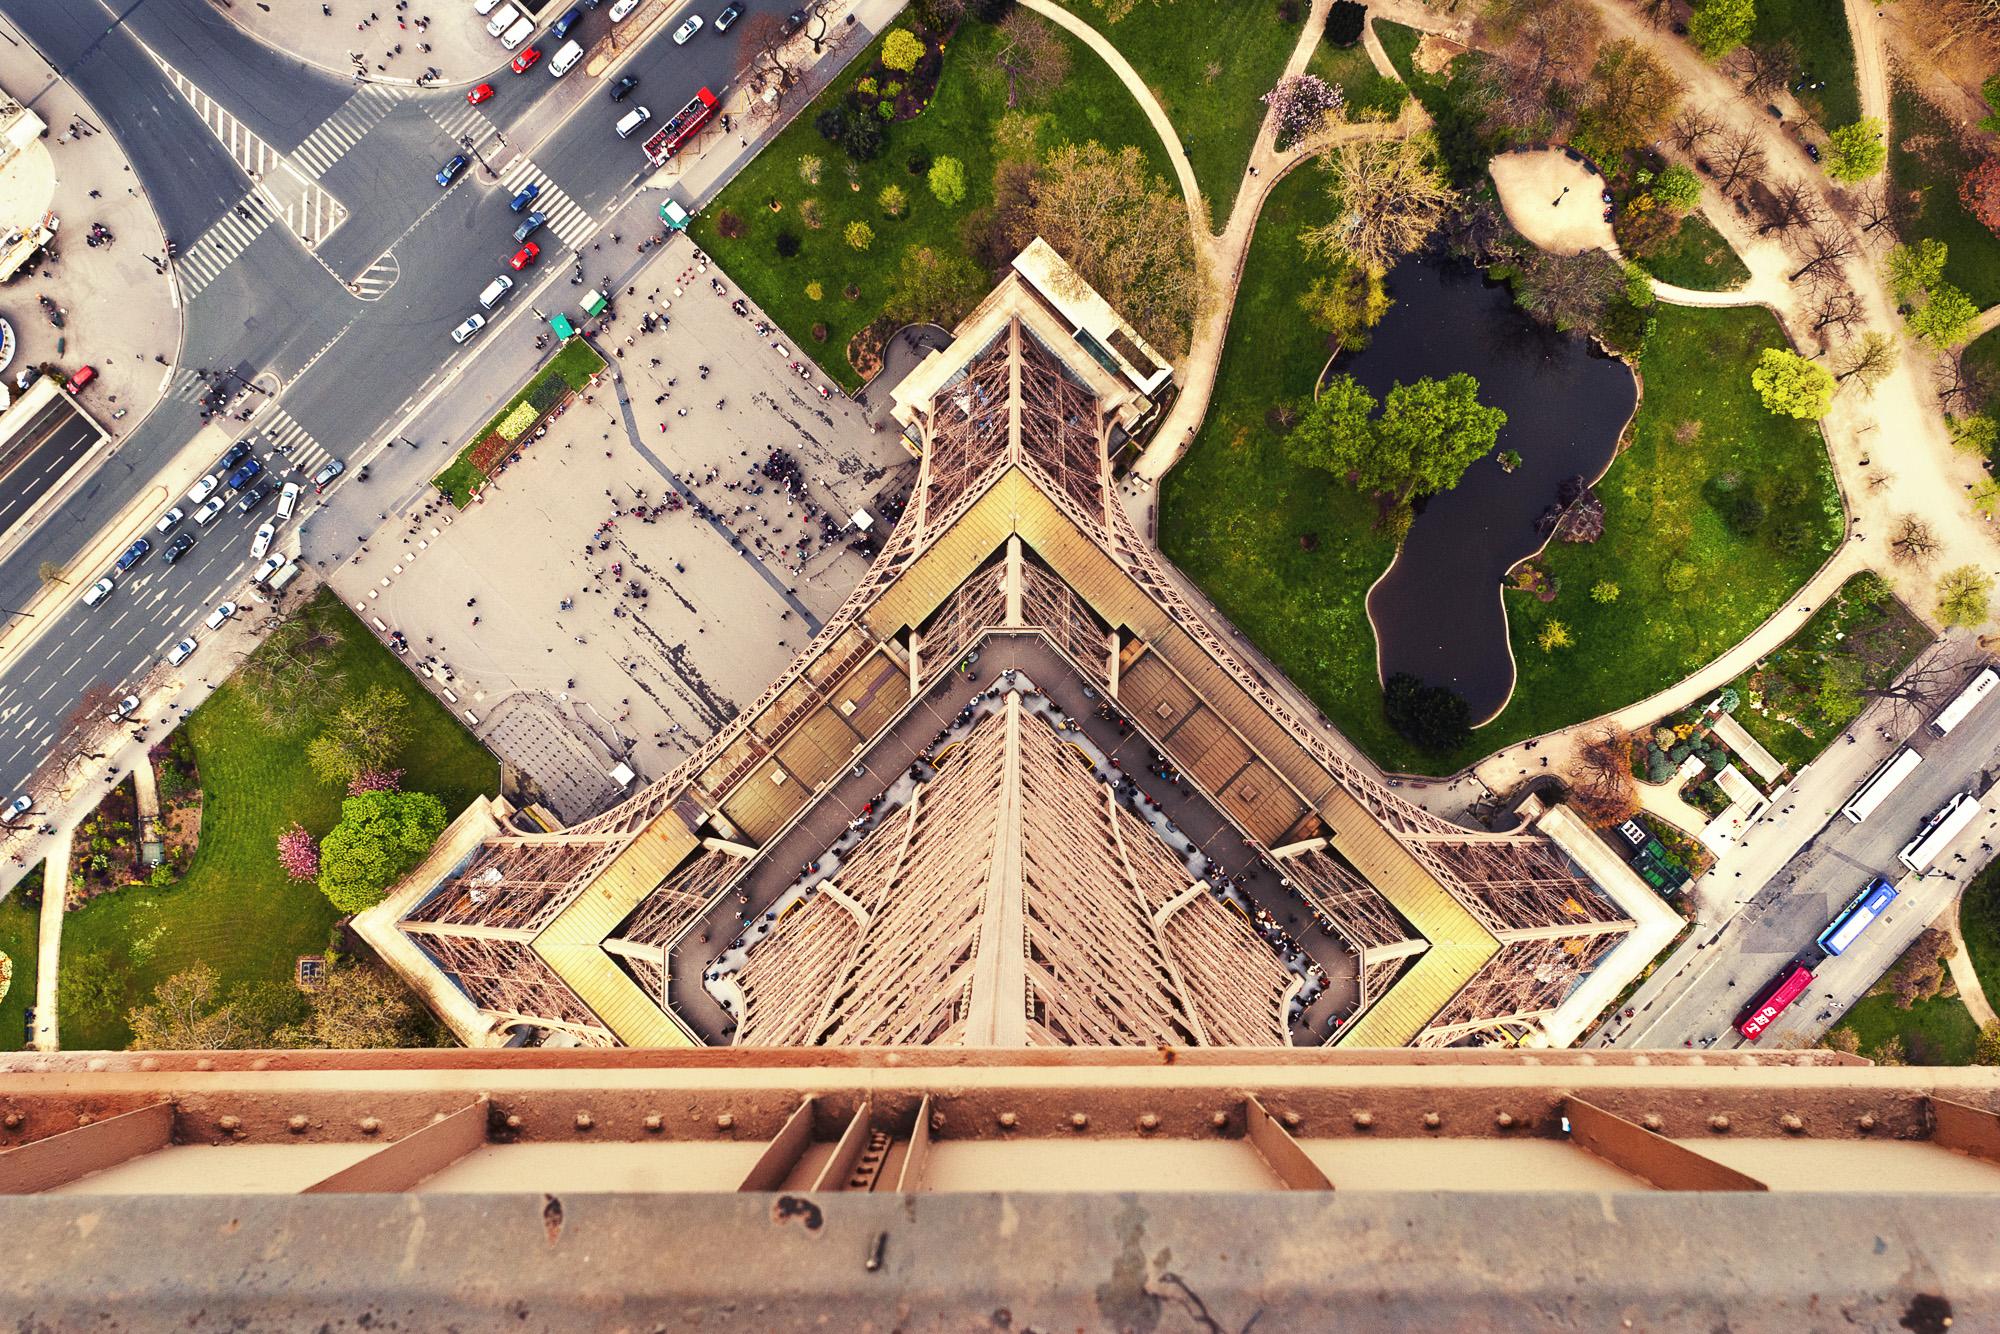 The Eiffel Tower - Paris, France  PHOTOGRAPHY: ALEXANDER J.E. BRADLEY •NIKON D200 • Nikon AF-NIKKOR 24mm Ƒ/2.8 D @Ƒ/8 •1/250 •ISO 100